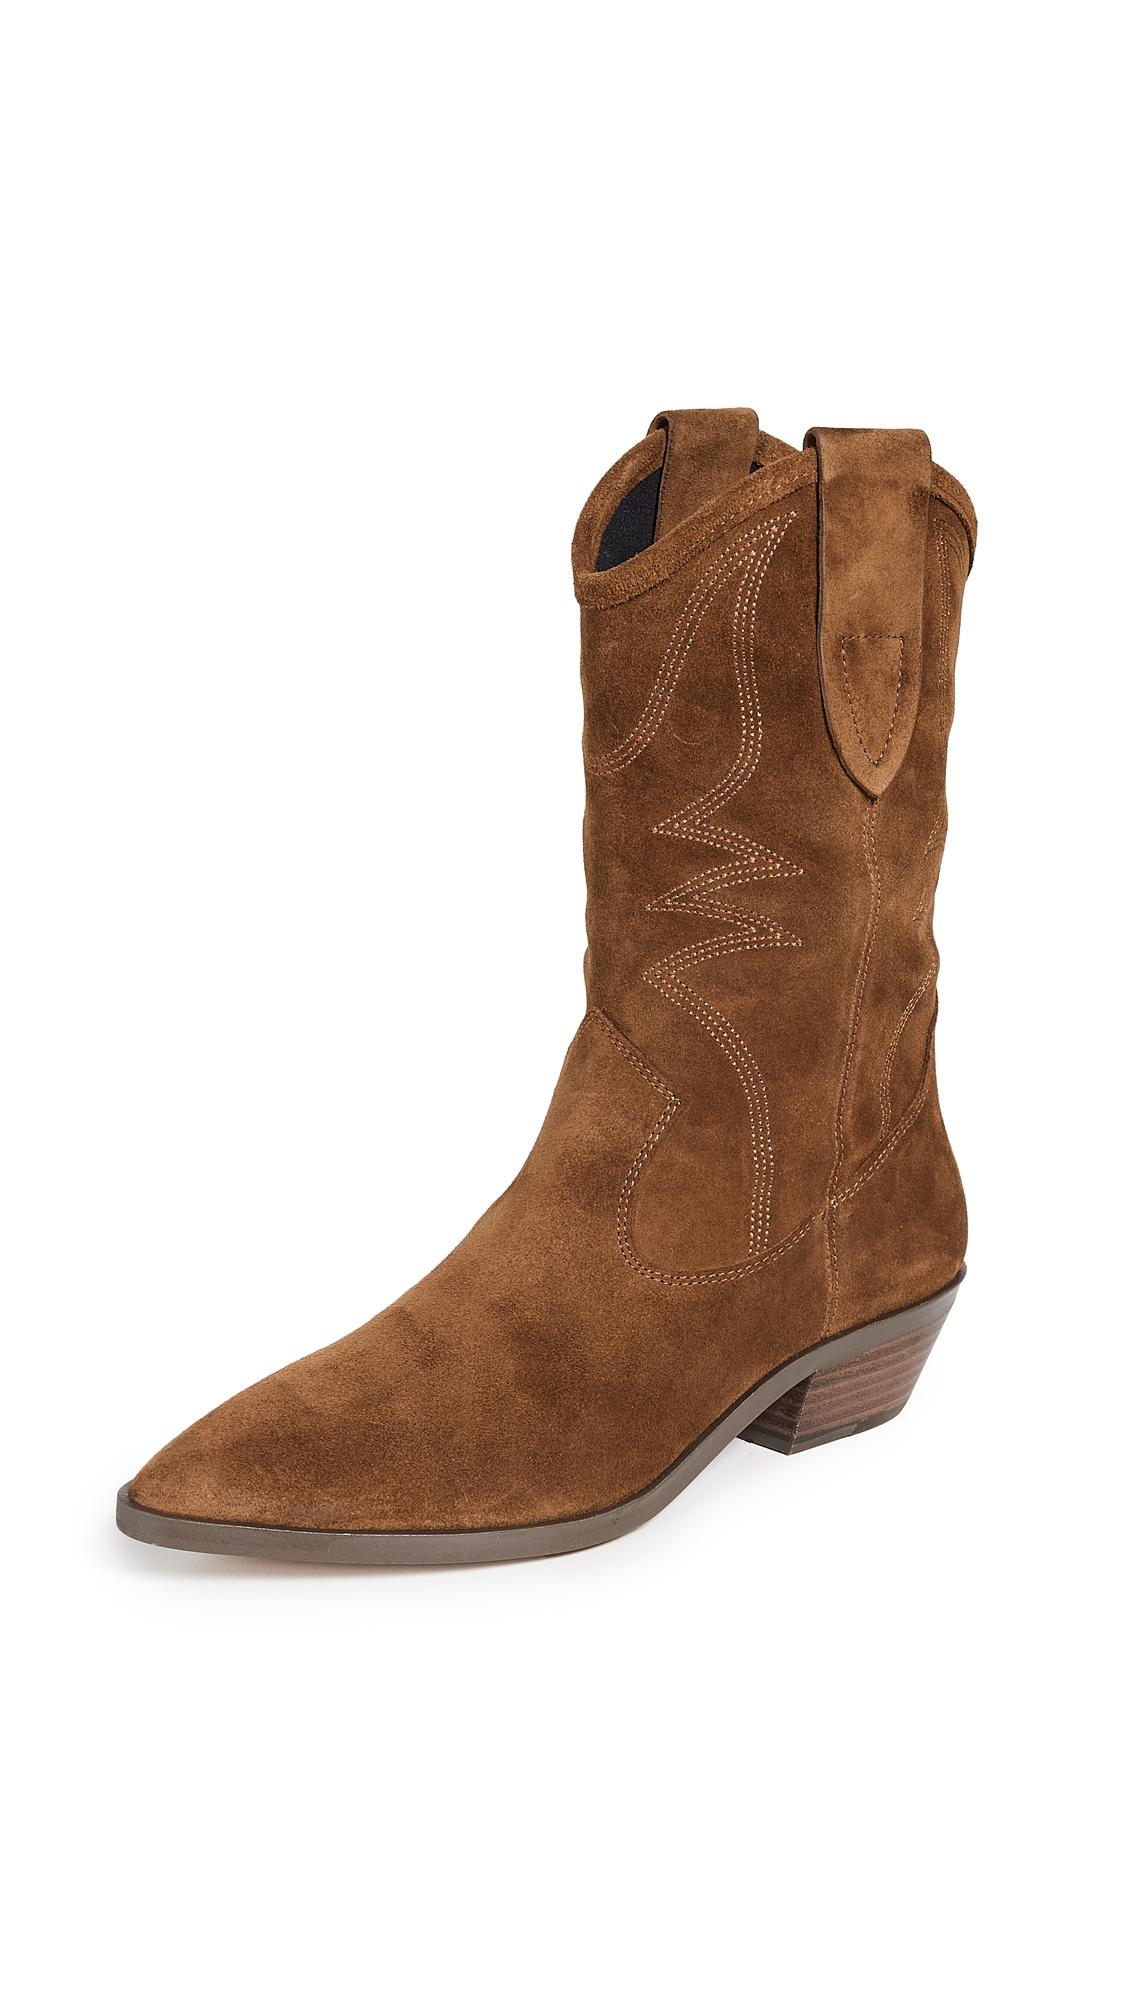 Rebecca Minkoff Kaiegan Western Boots - Saddle